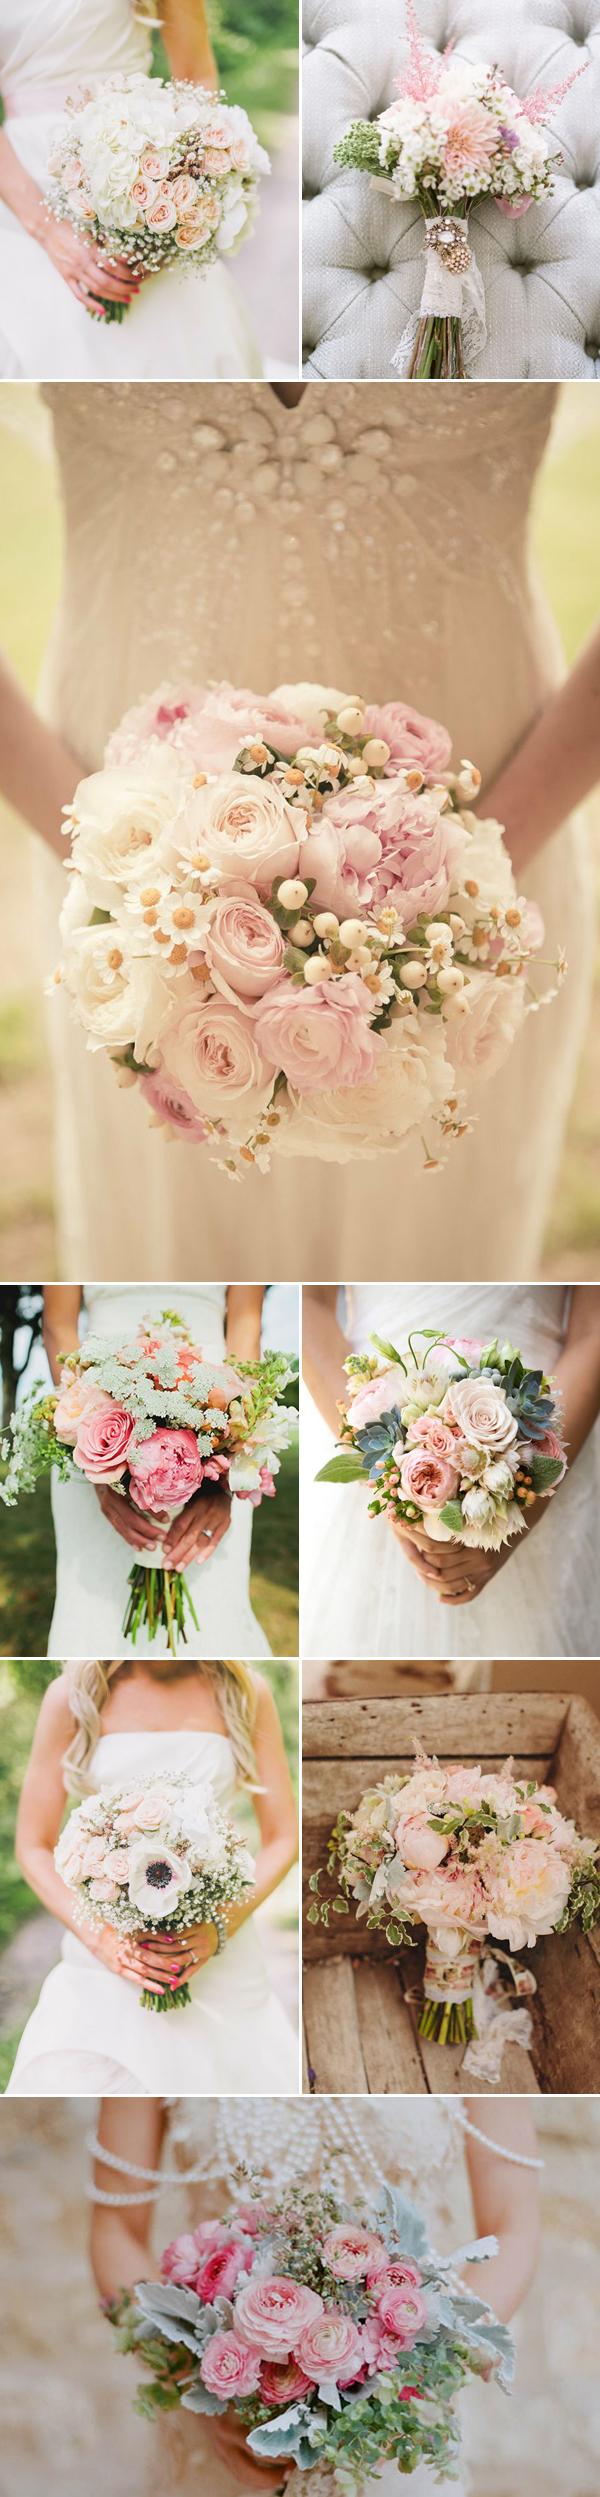 pinkbouquets03-vintage